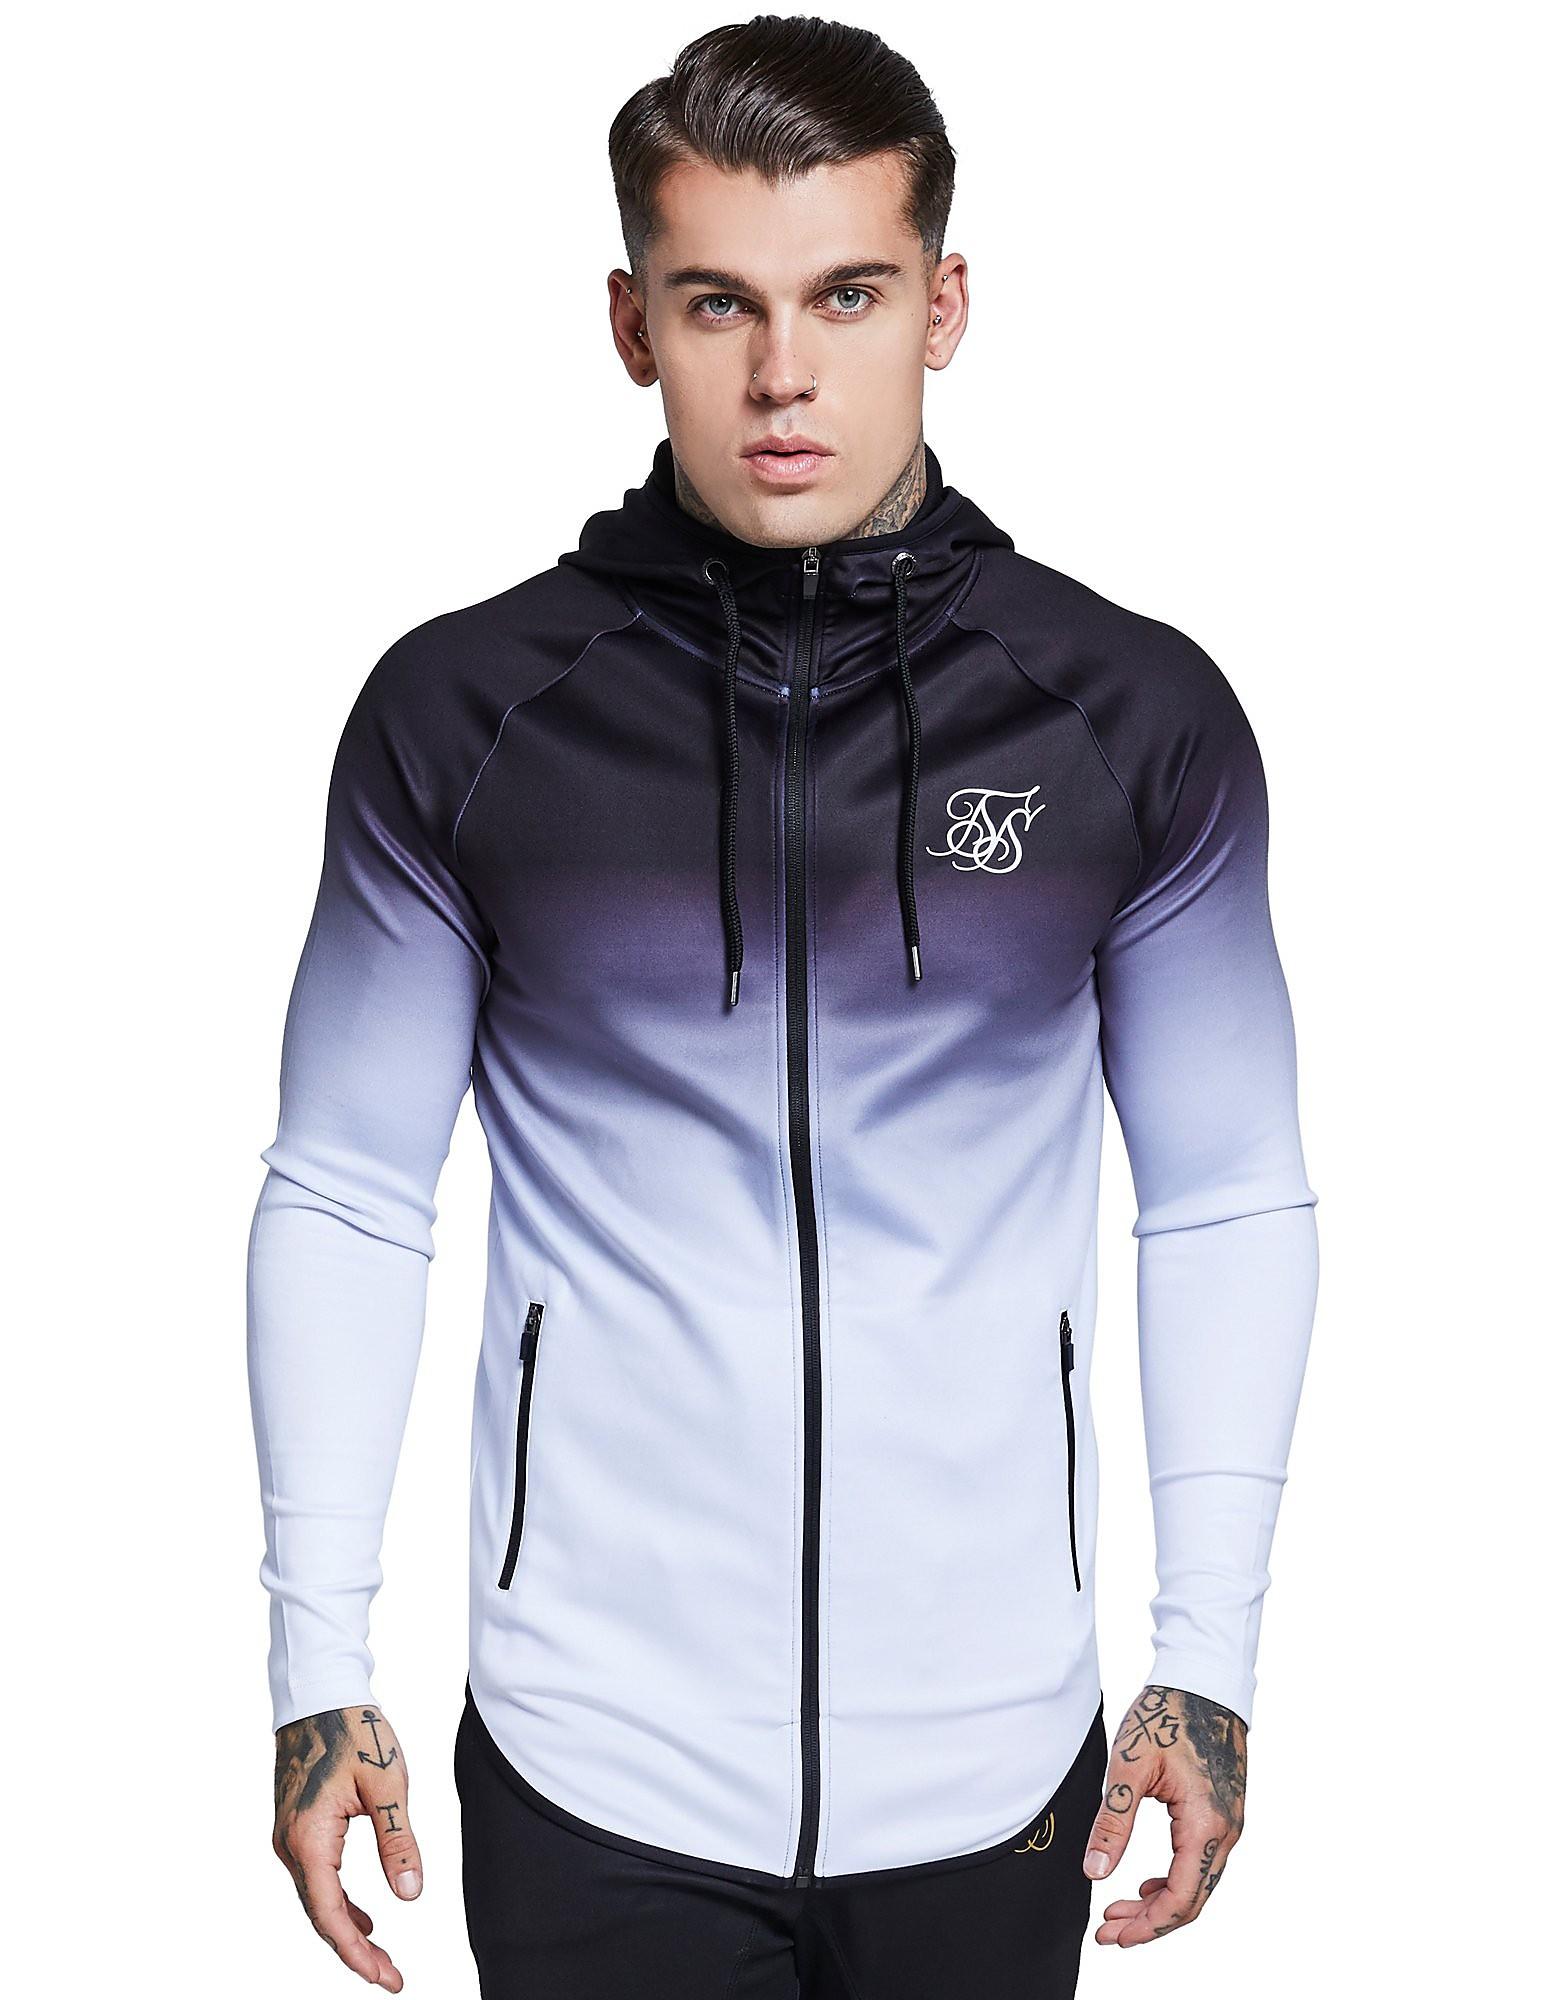 SikSilk chaqueta con capucha Athlete